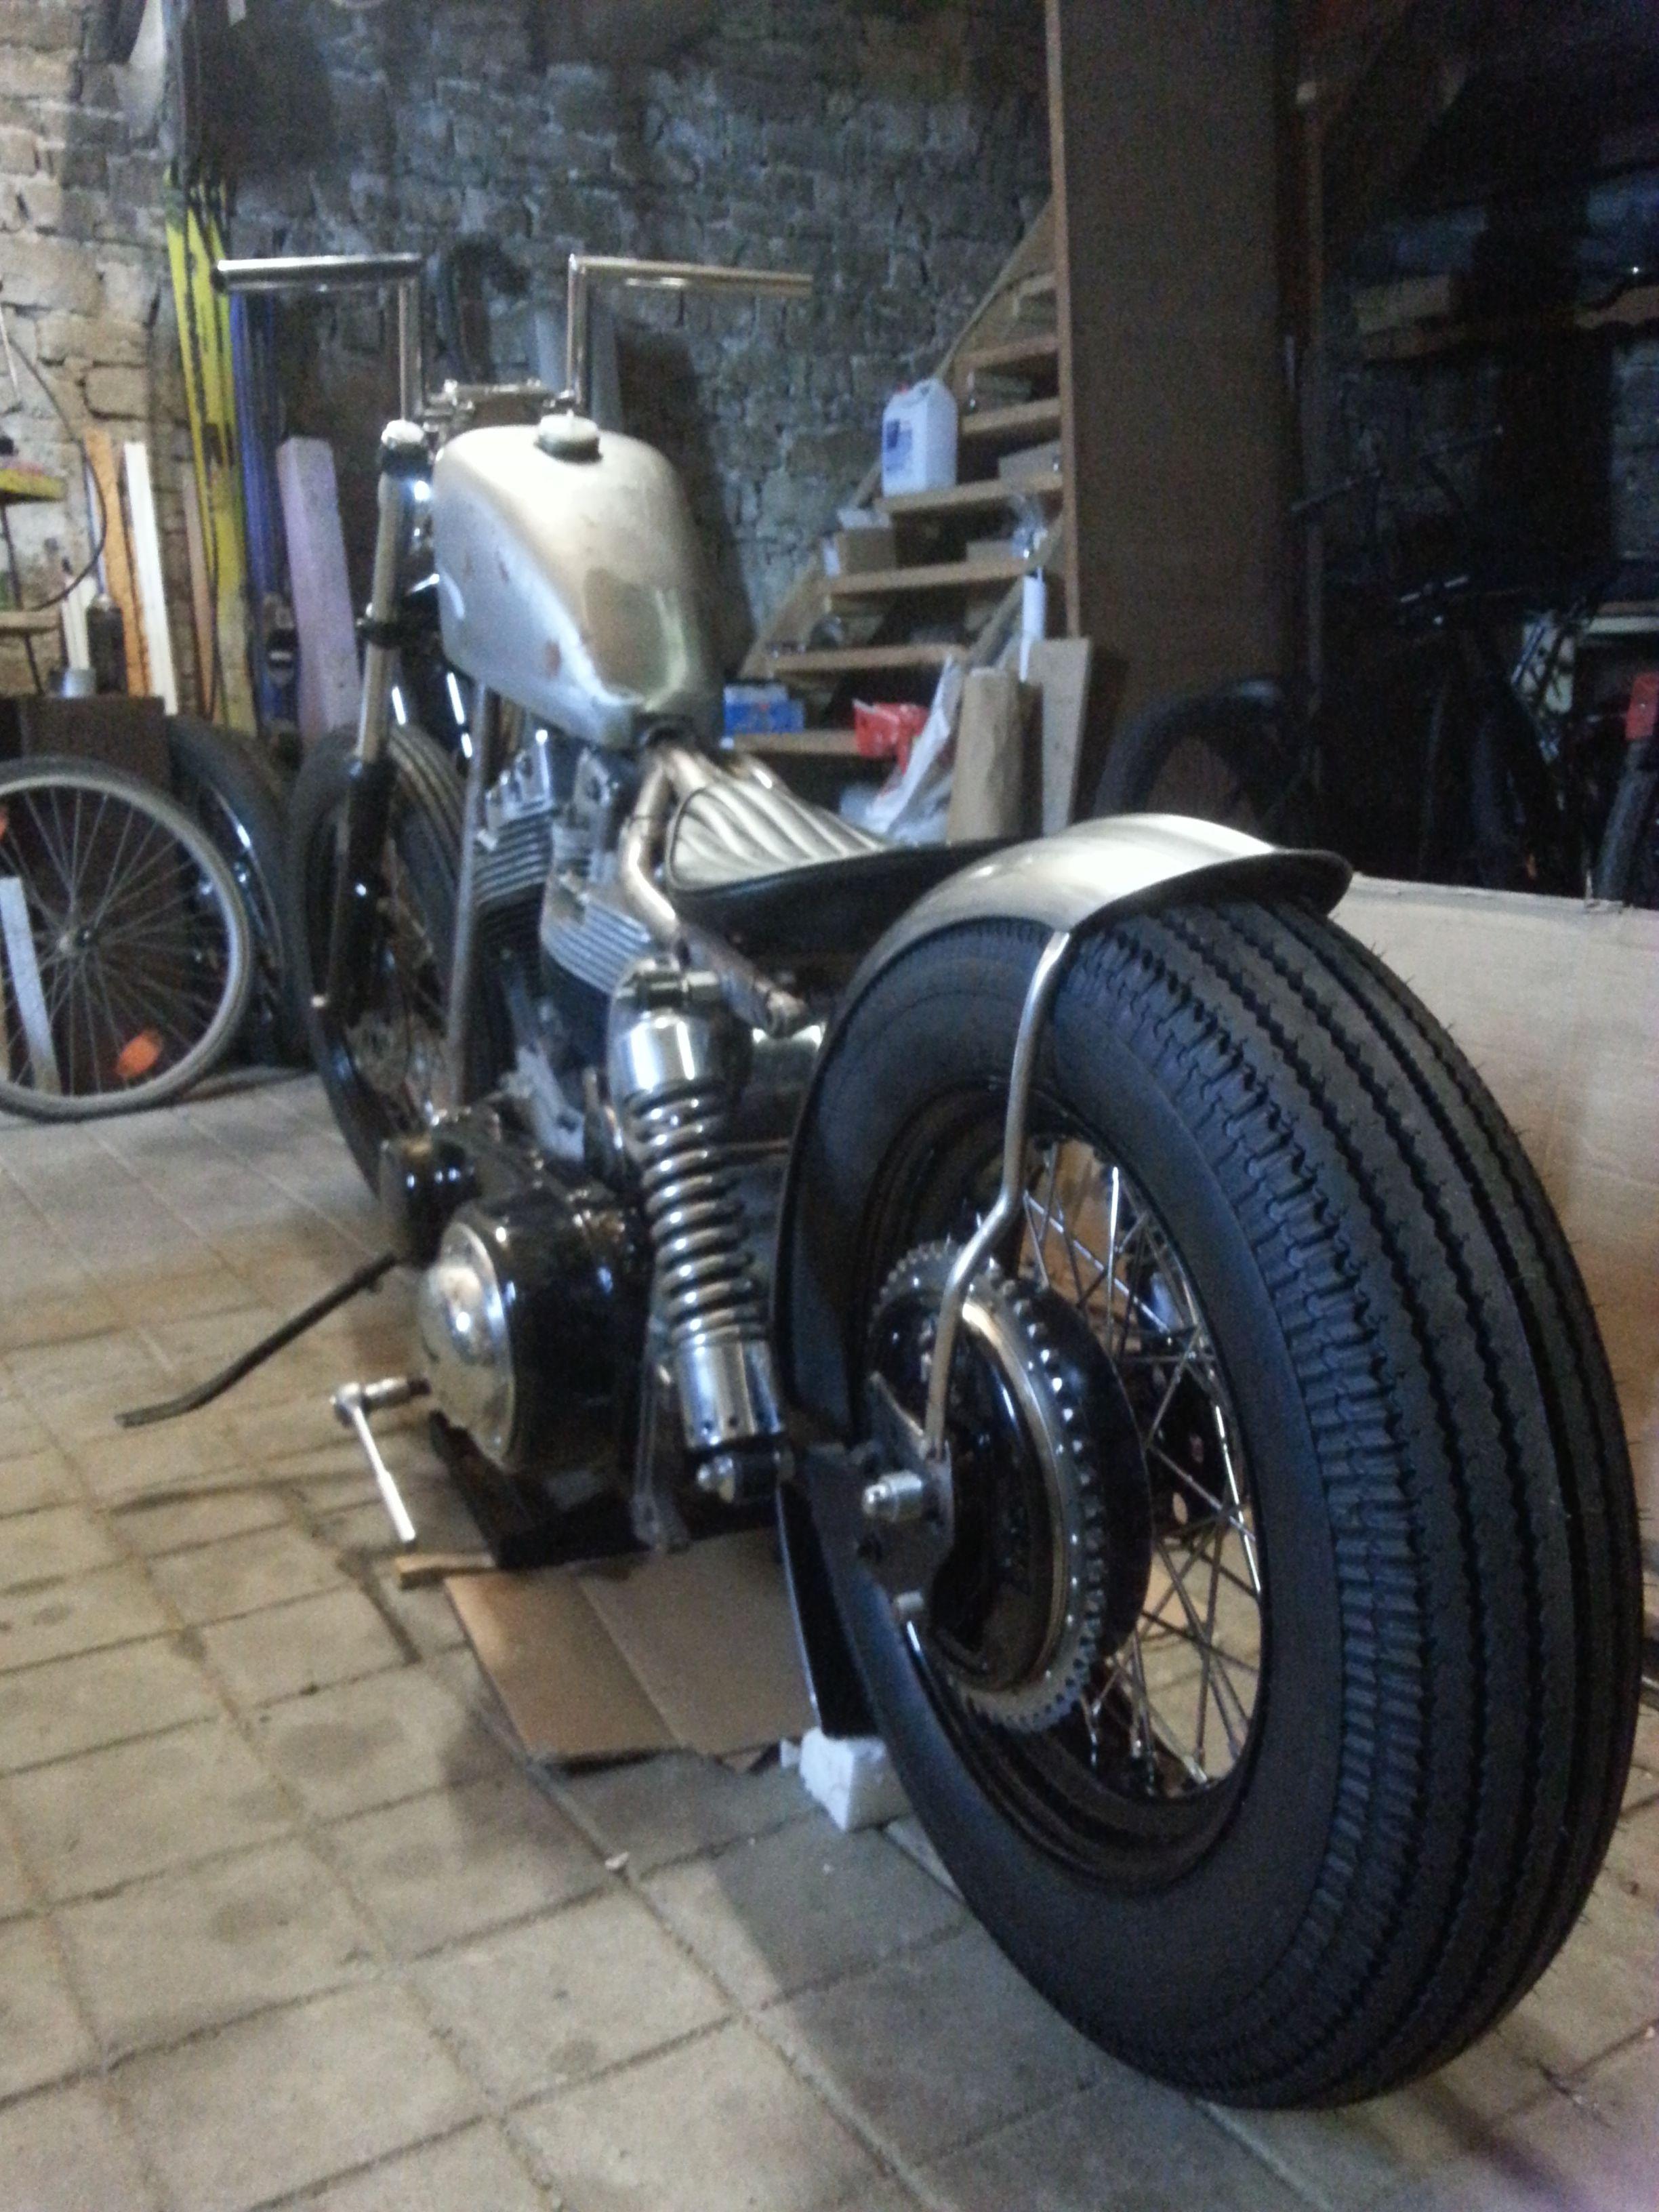 August 2015 Shovelhead Bobber Project Rear Wheel Custom Rim 4 00 16 And Shinko Shr 270 Classic Series Tire Thats A Nice View I D Say Avec Images Pneu Bobber Moto